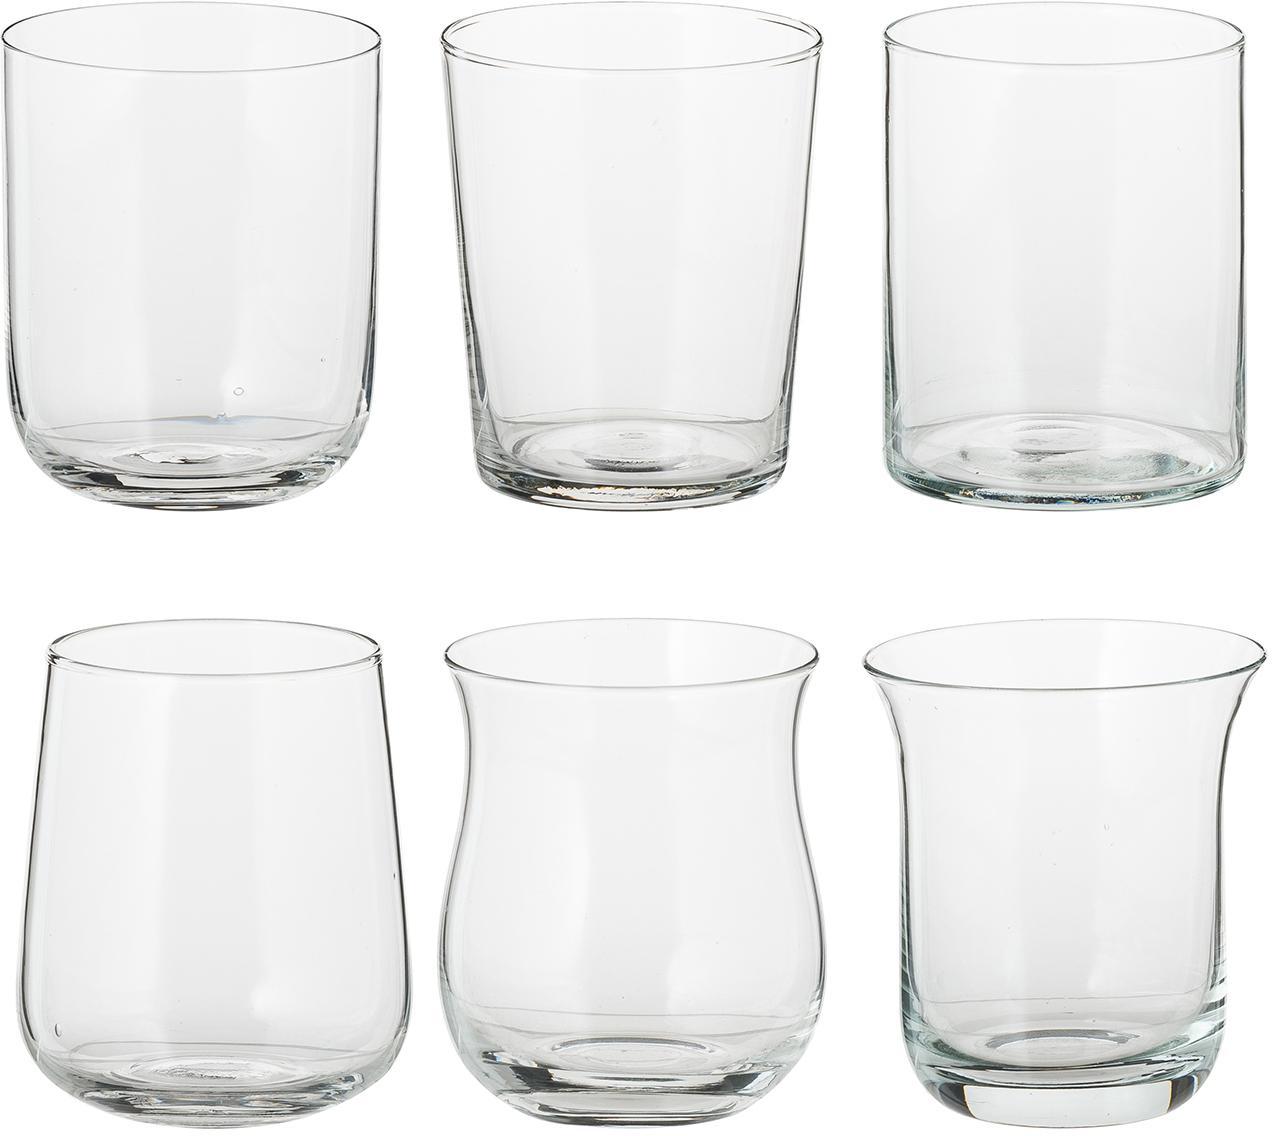 Mondgeblazen waterglazenset Desigual, 6-delig, Mondgeblazen glas, Transparant, Ø 8 x H 10 cm